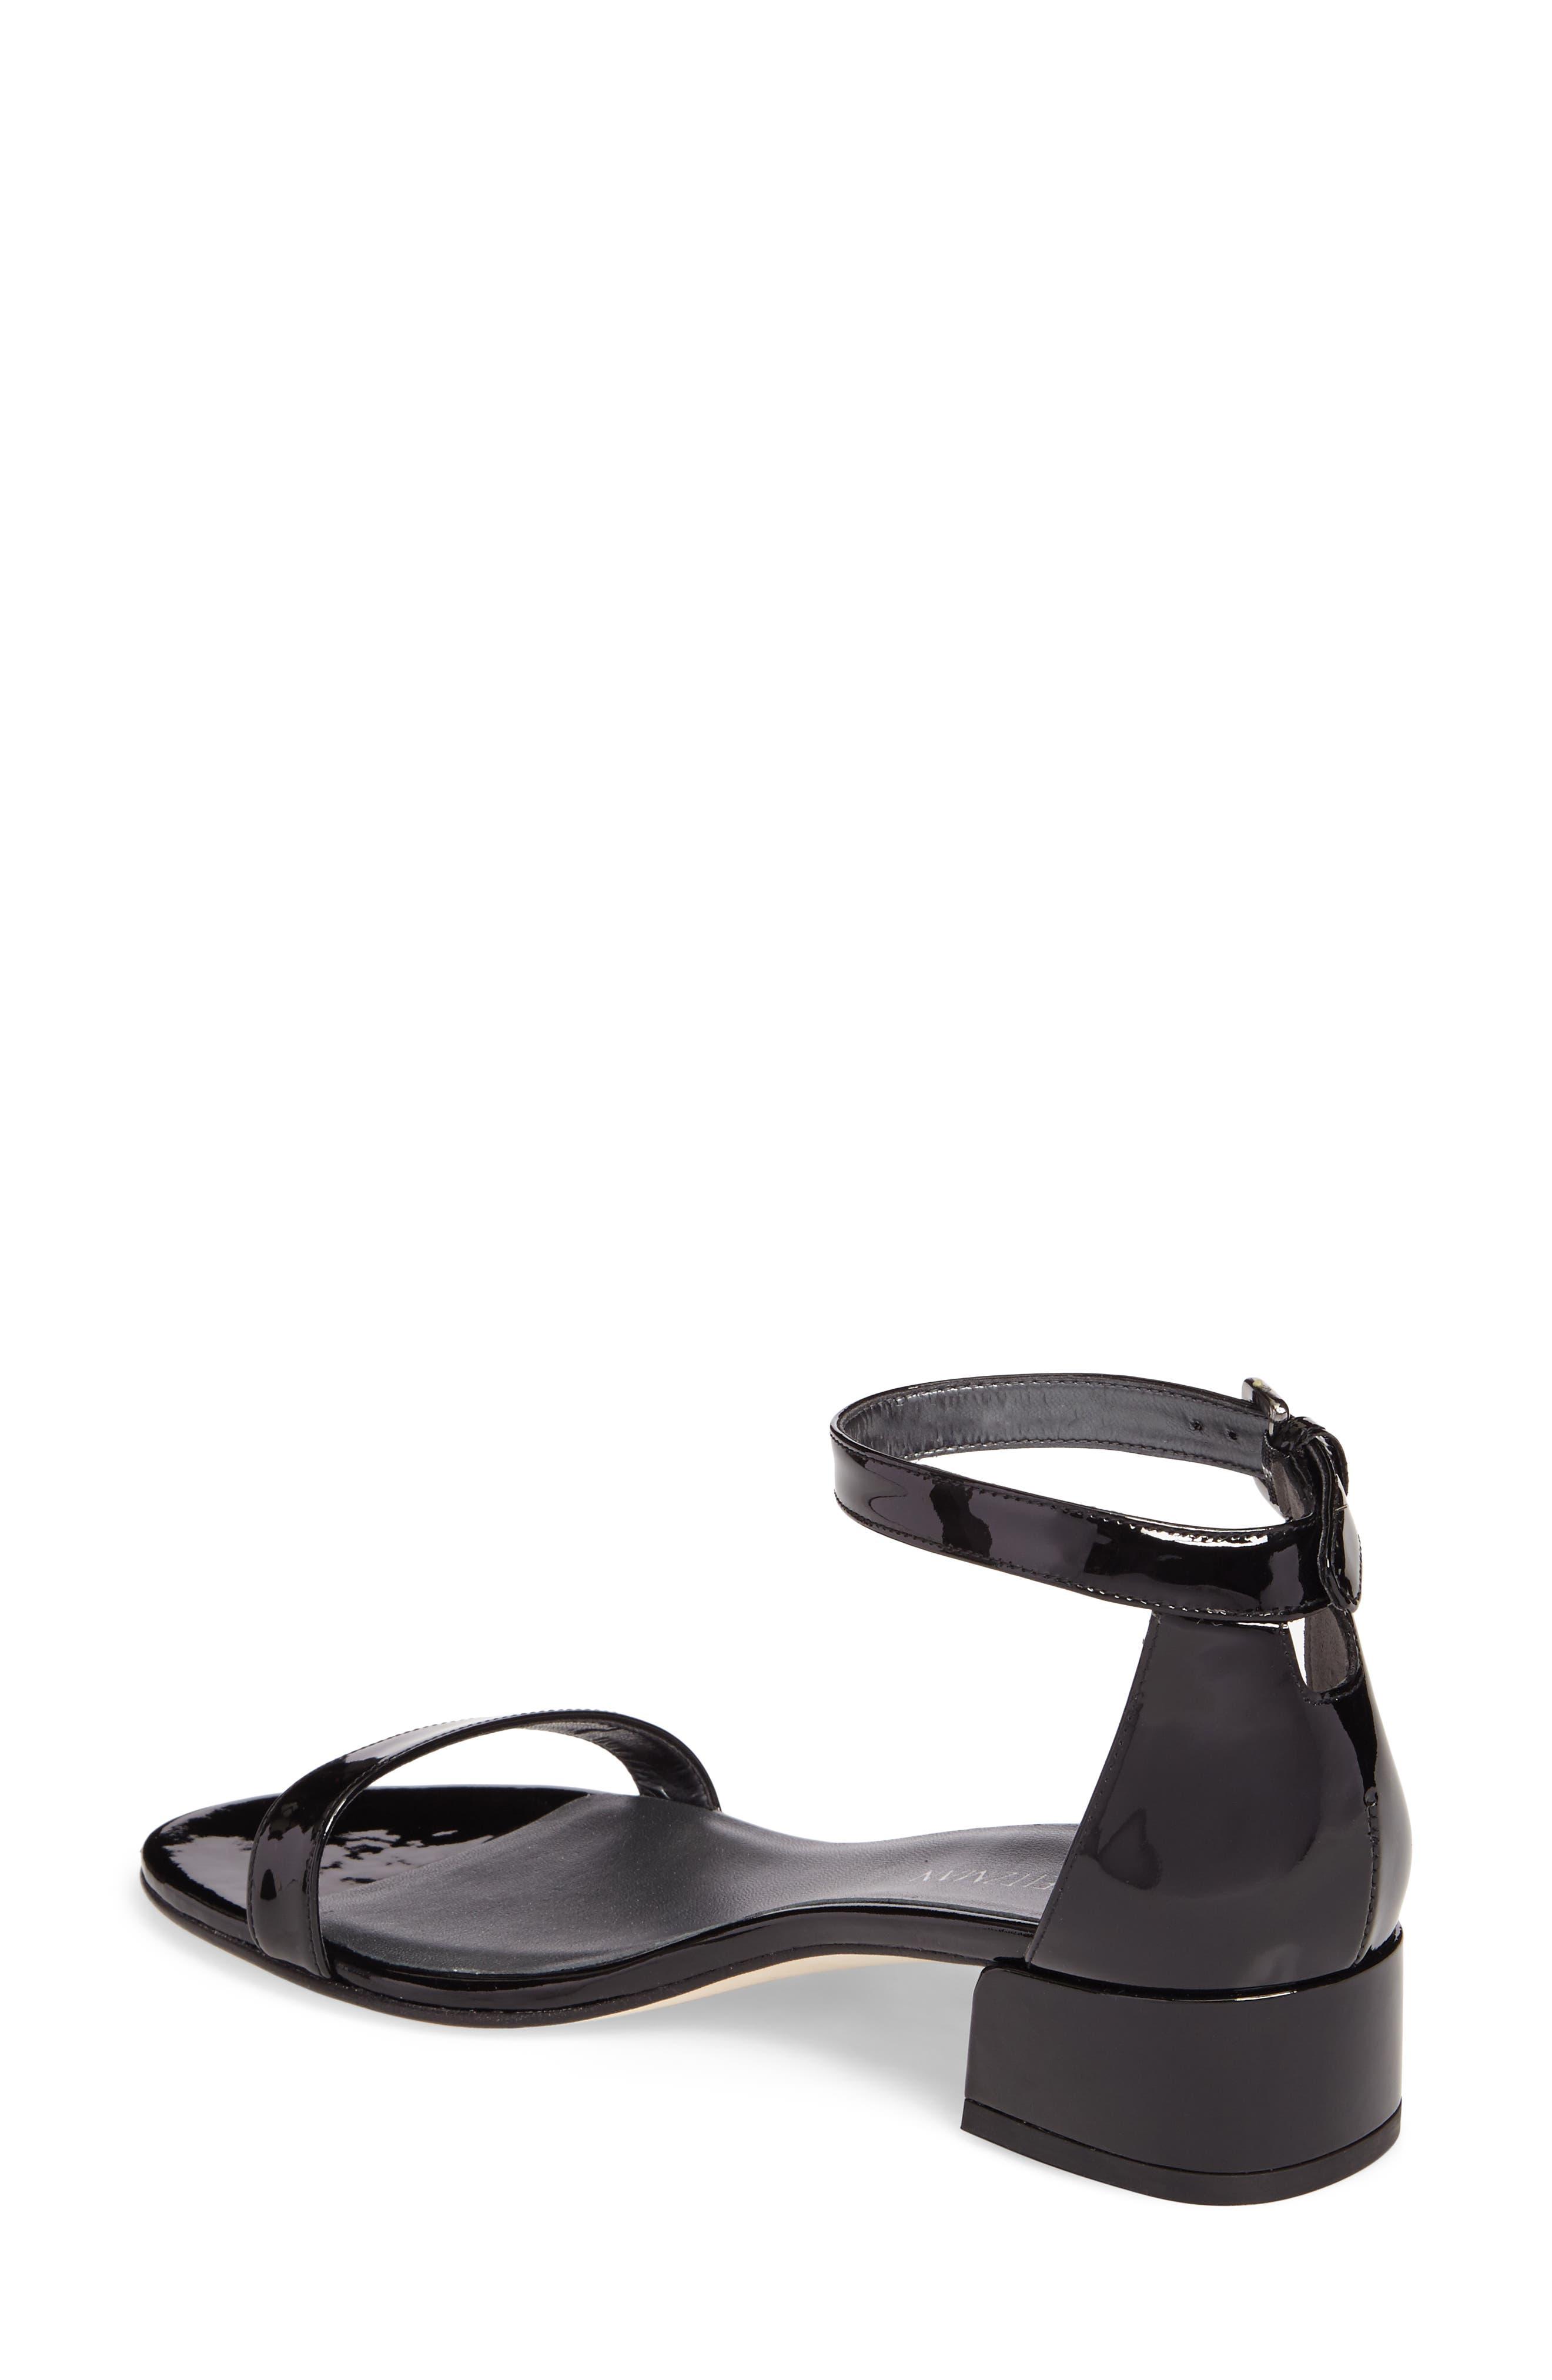 NudistJune Block Heel Sandal,                             Alternate thumbnail 2, color,                             002